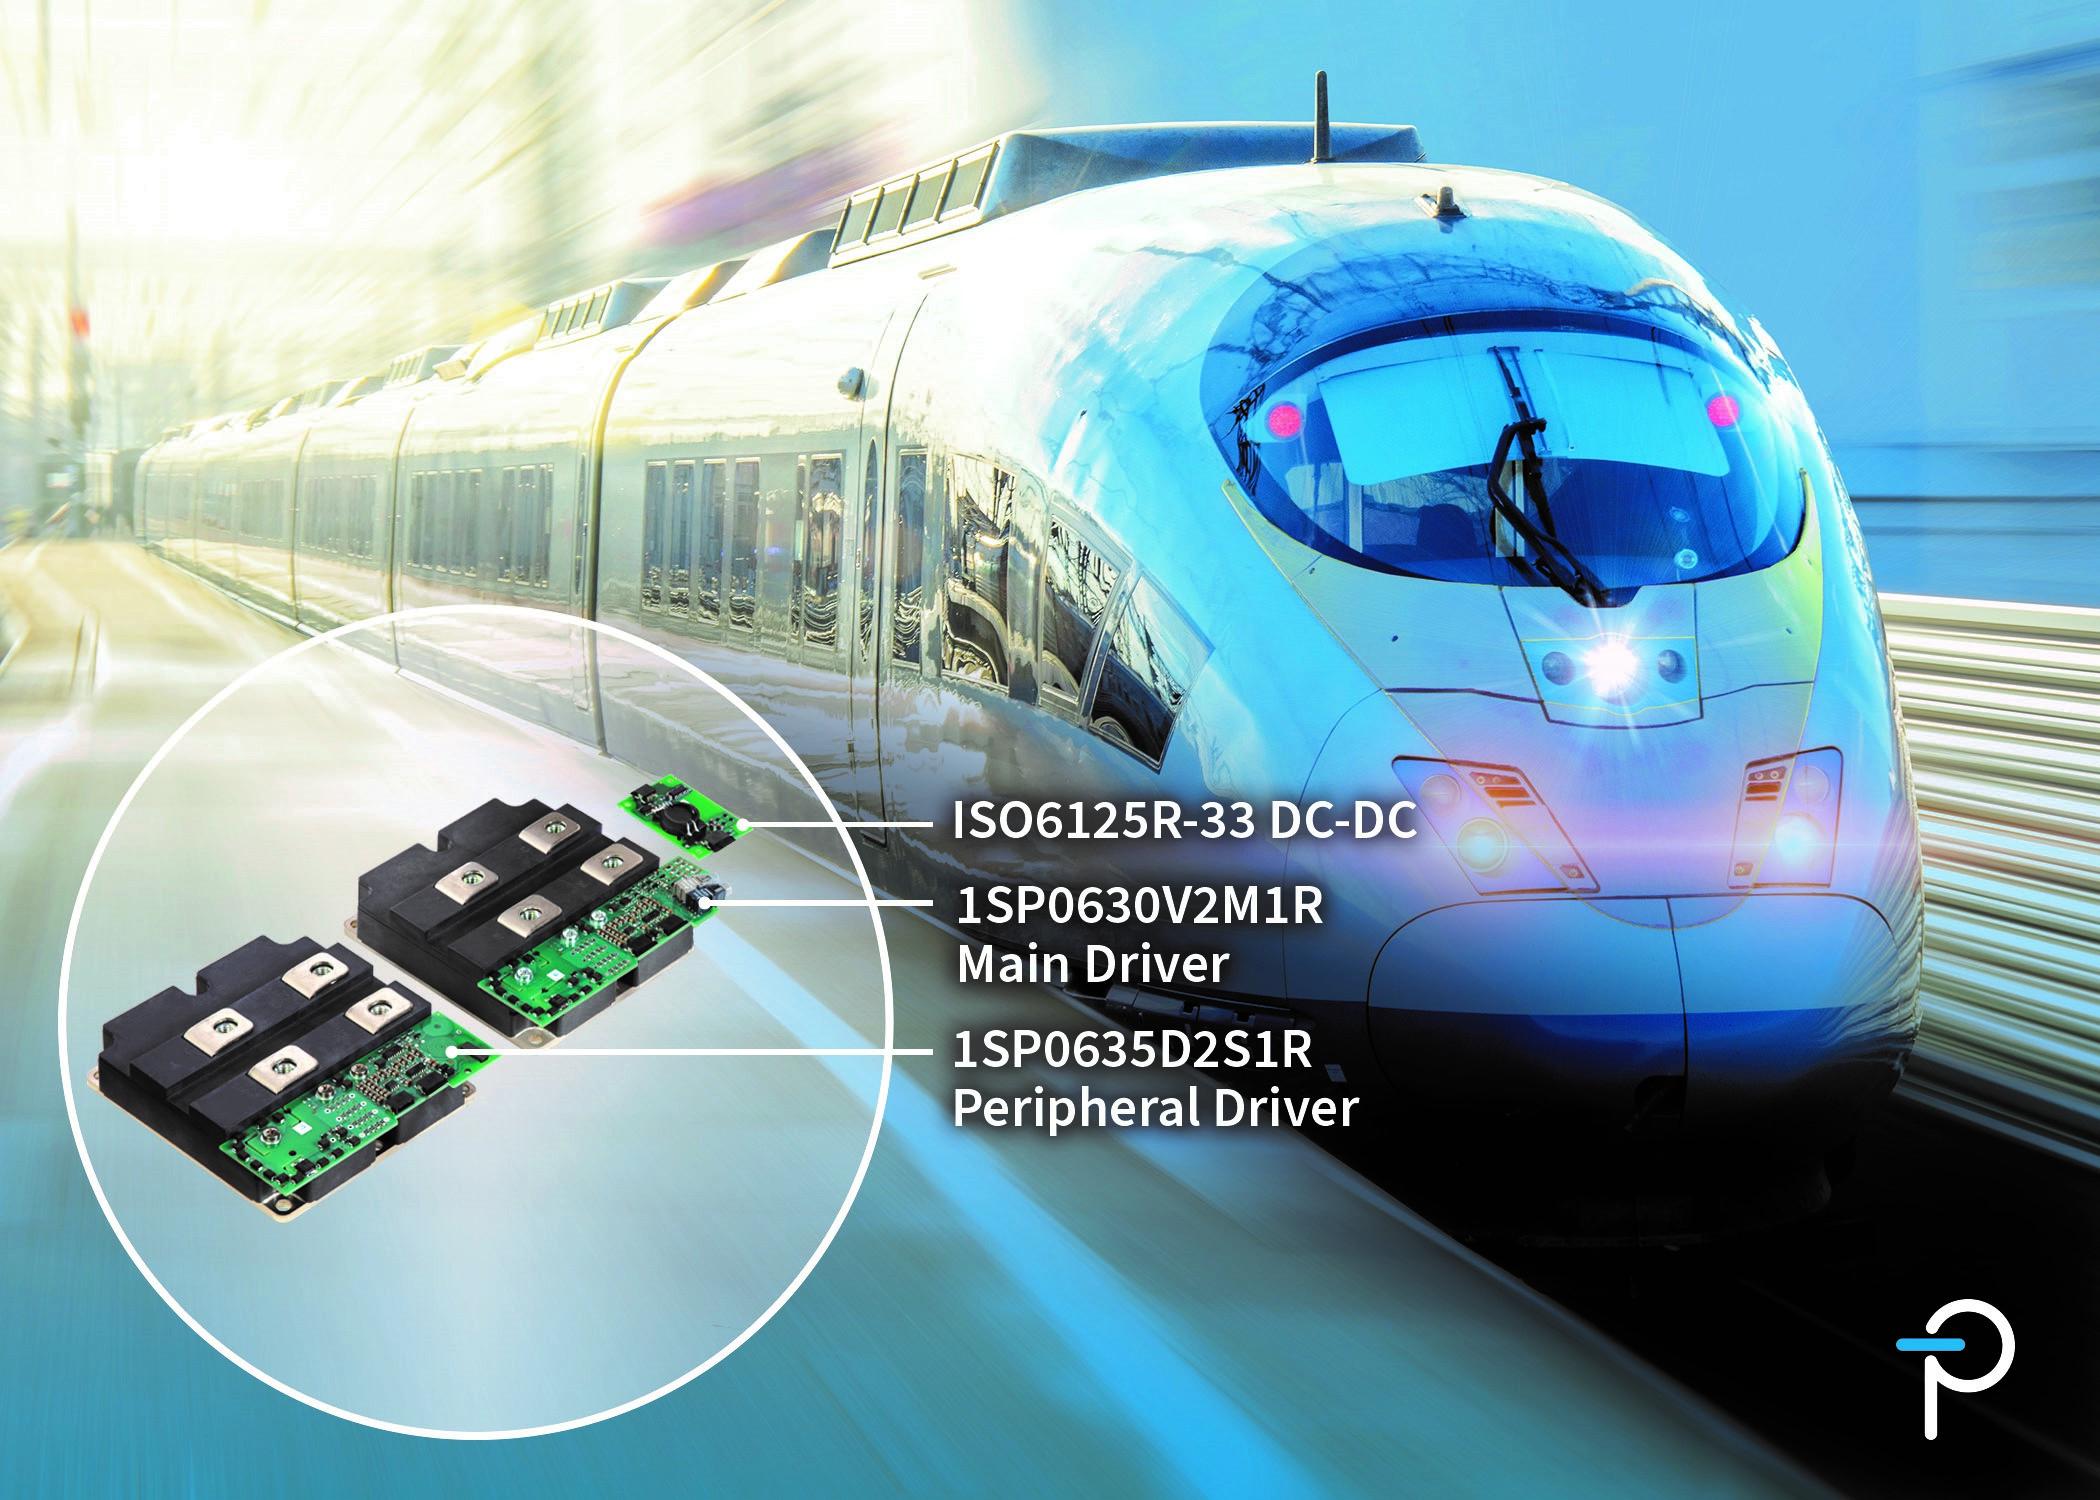 Power Integrations面向轨道交通应用推出新款外形紧凑、坚固耐用的SCALE-2即插即用型门极驱动器